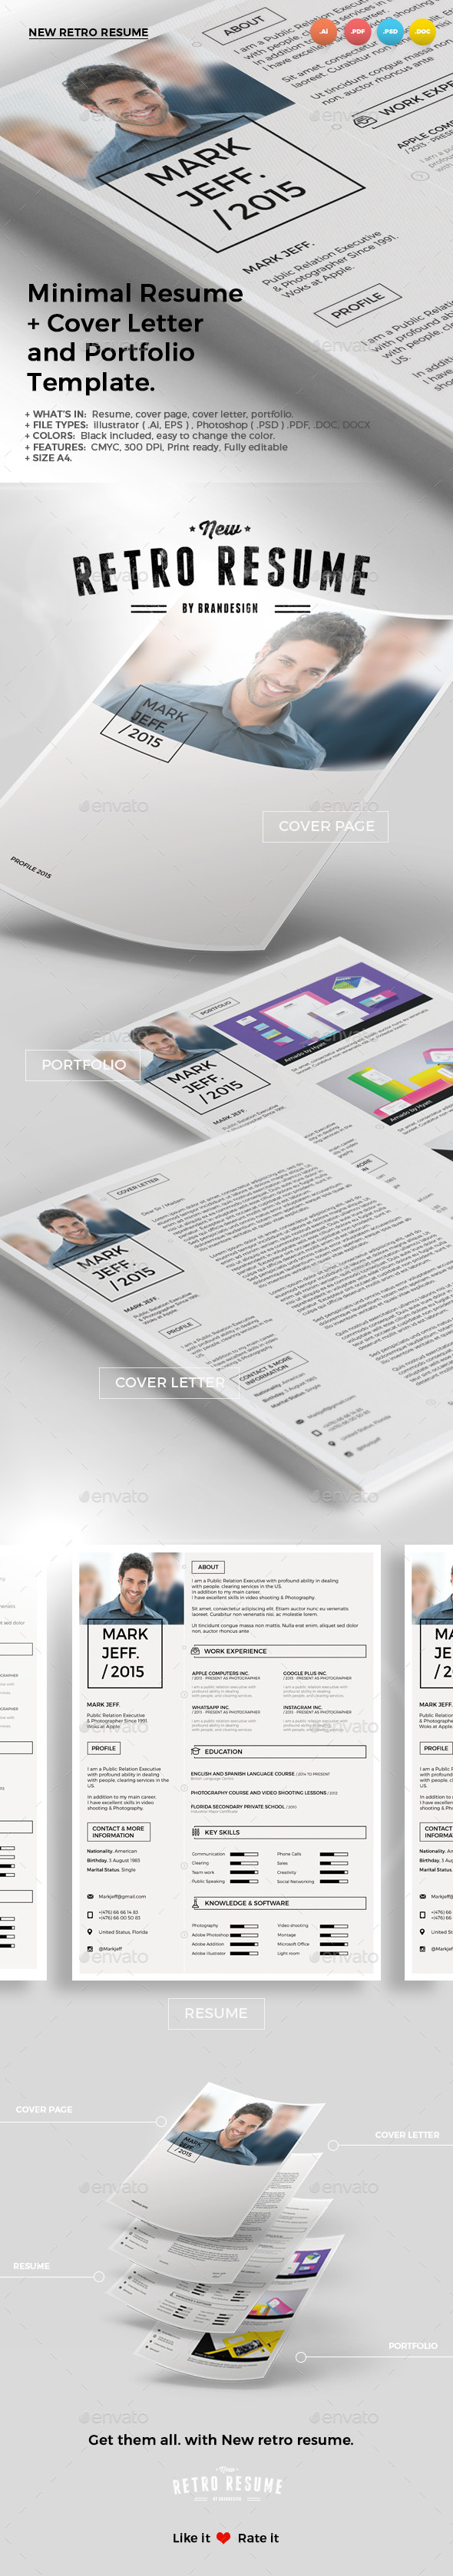 GraphicRiver New Retro Resume 10203076